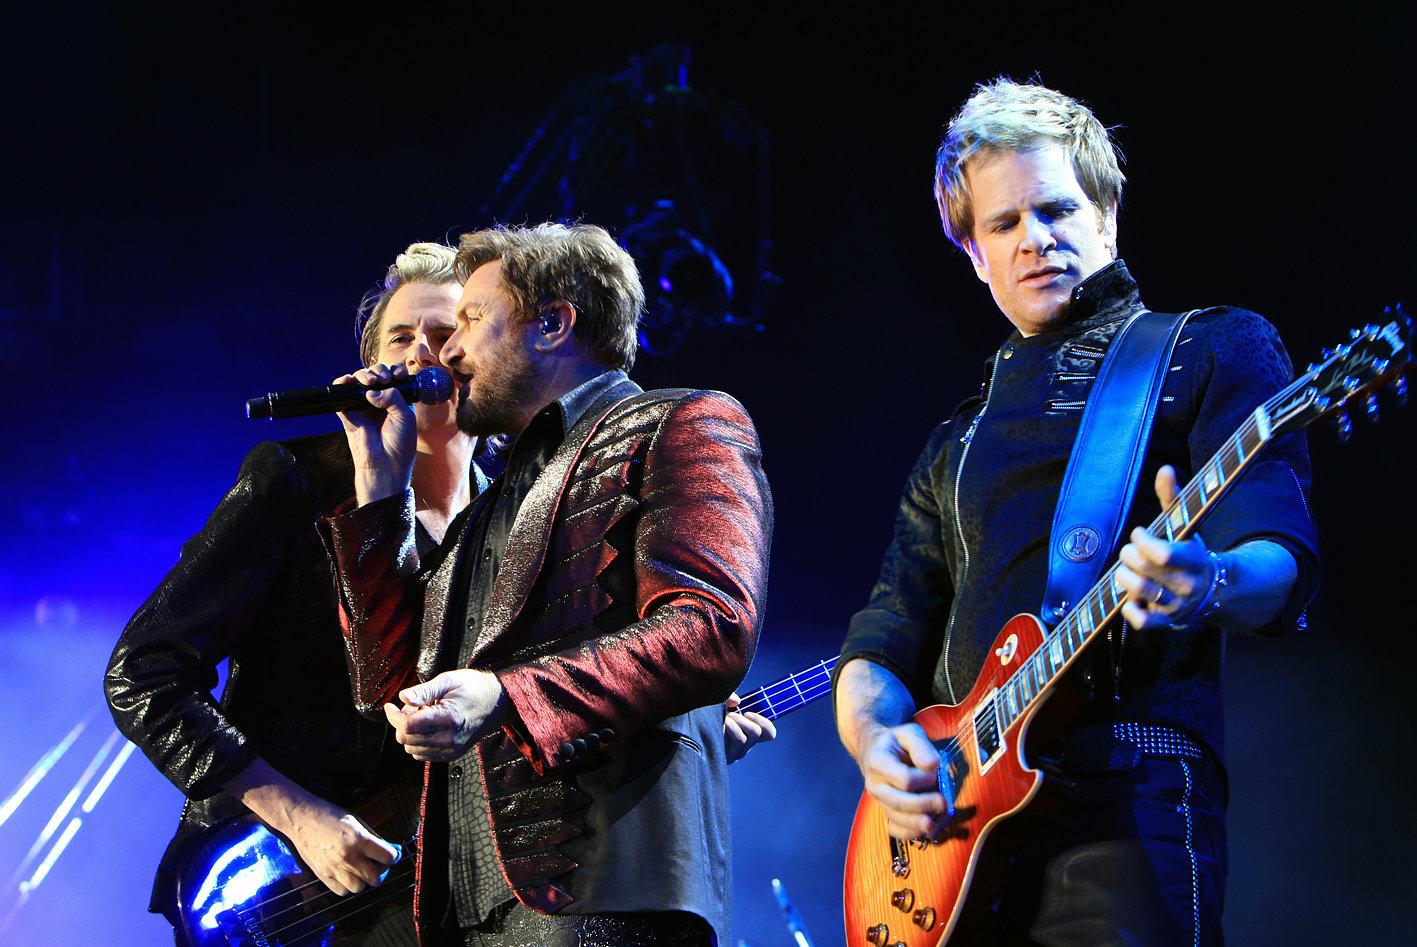 Duran Duran - Manchester Arena